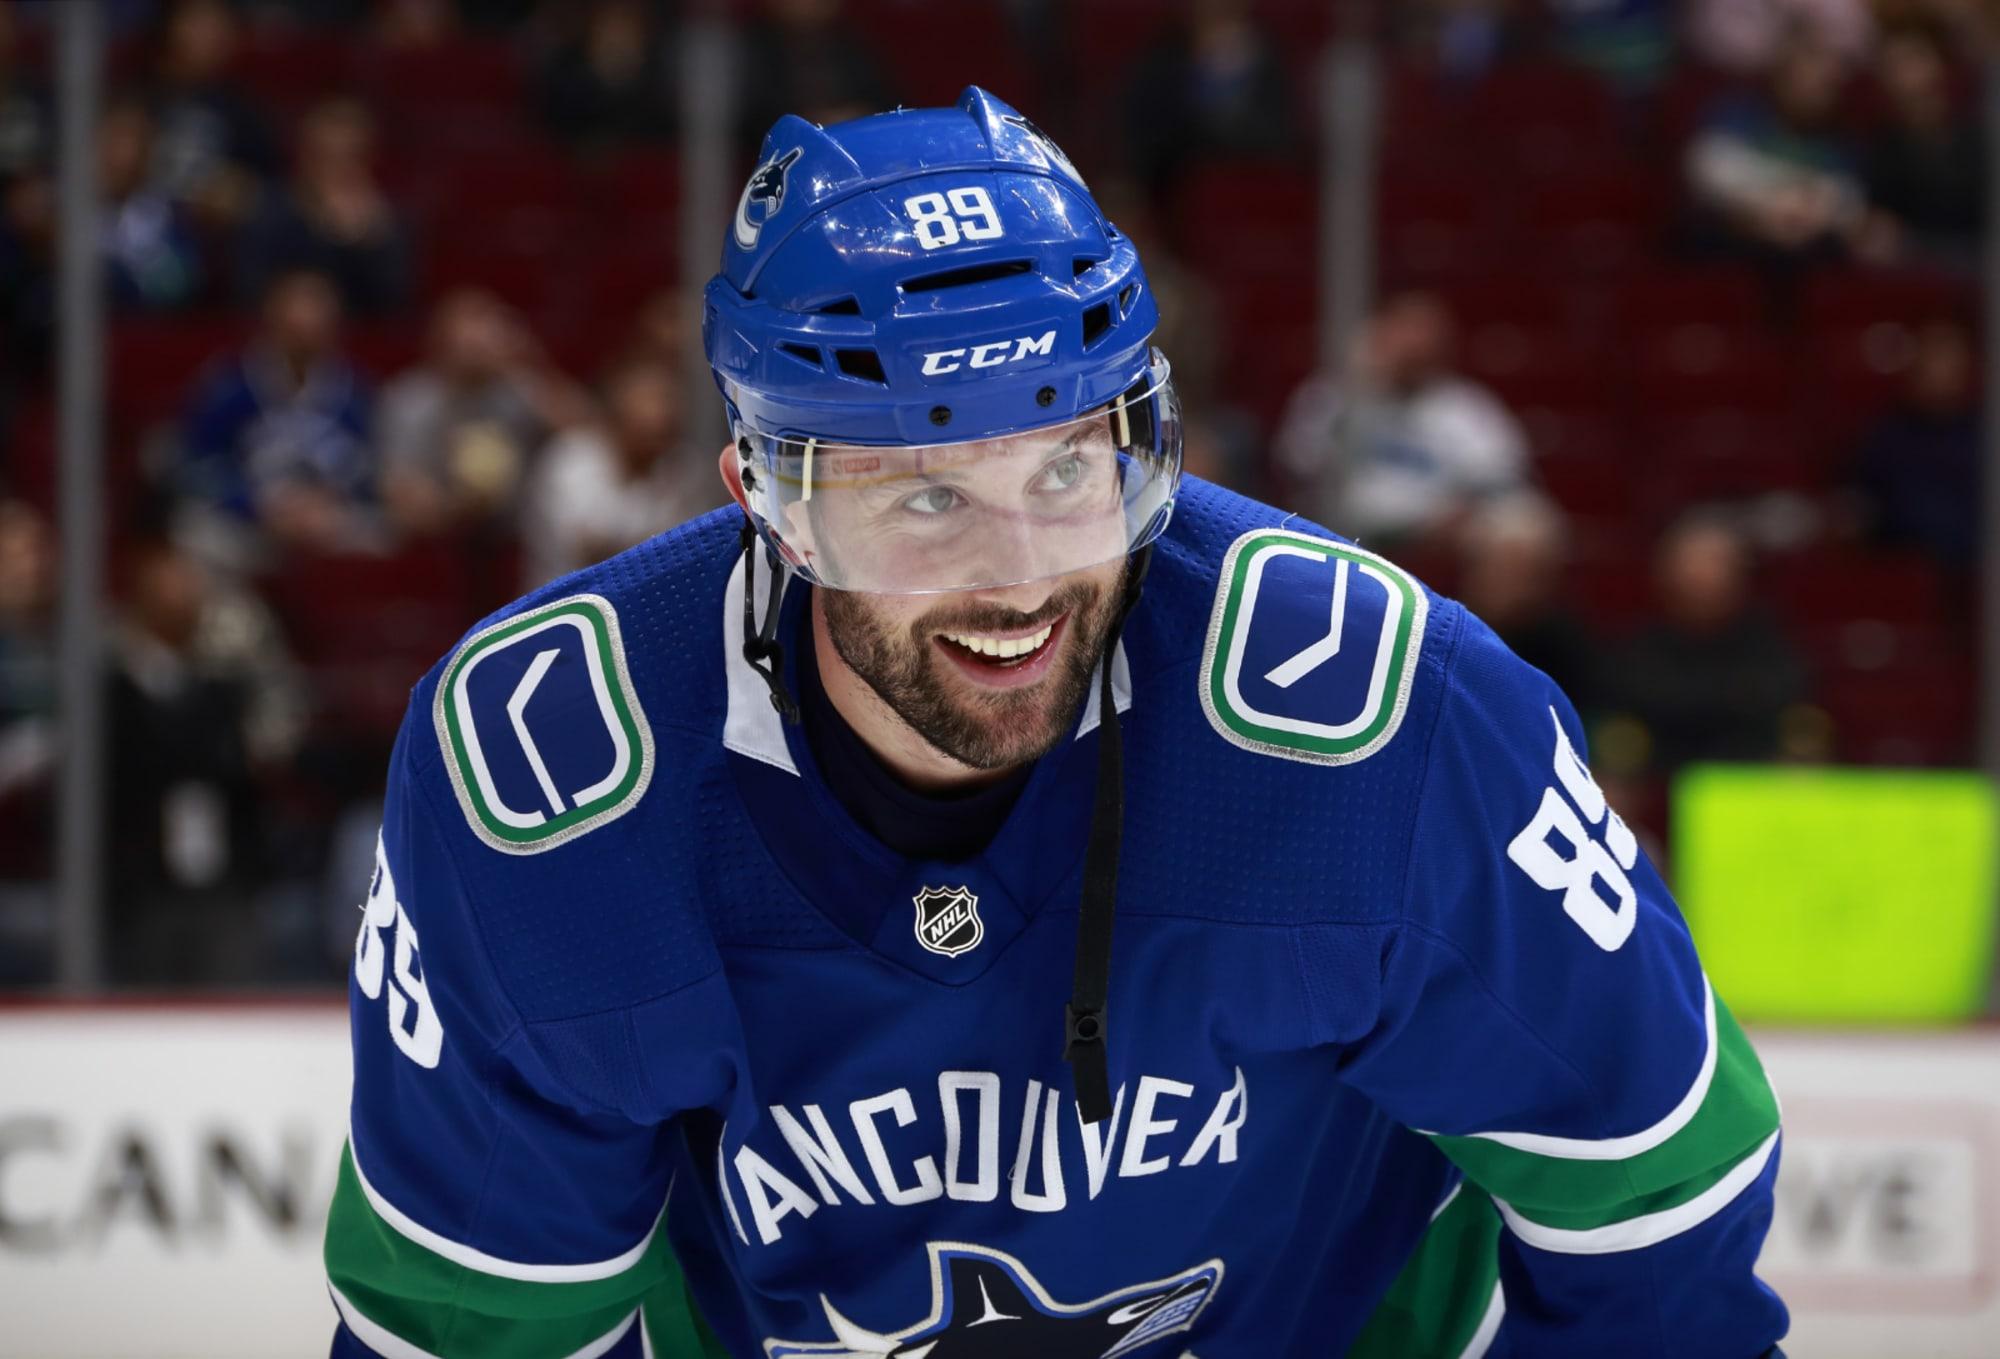 Vancouver Canucks Trade Sam Gagner In Exchange For Ryan Spooner